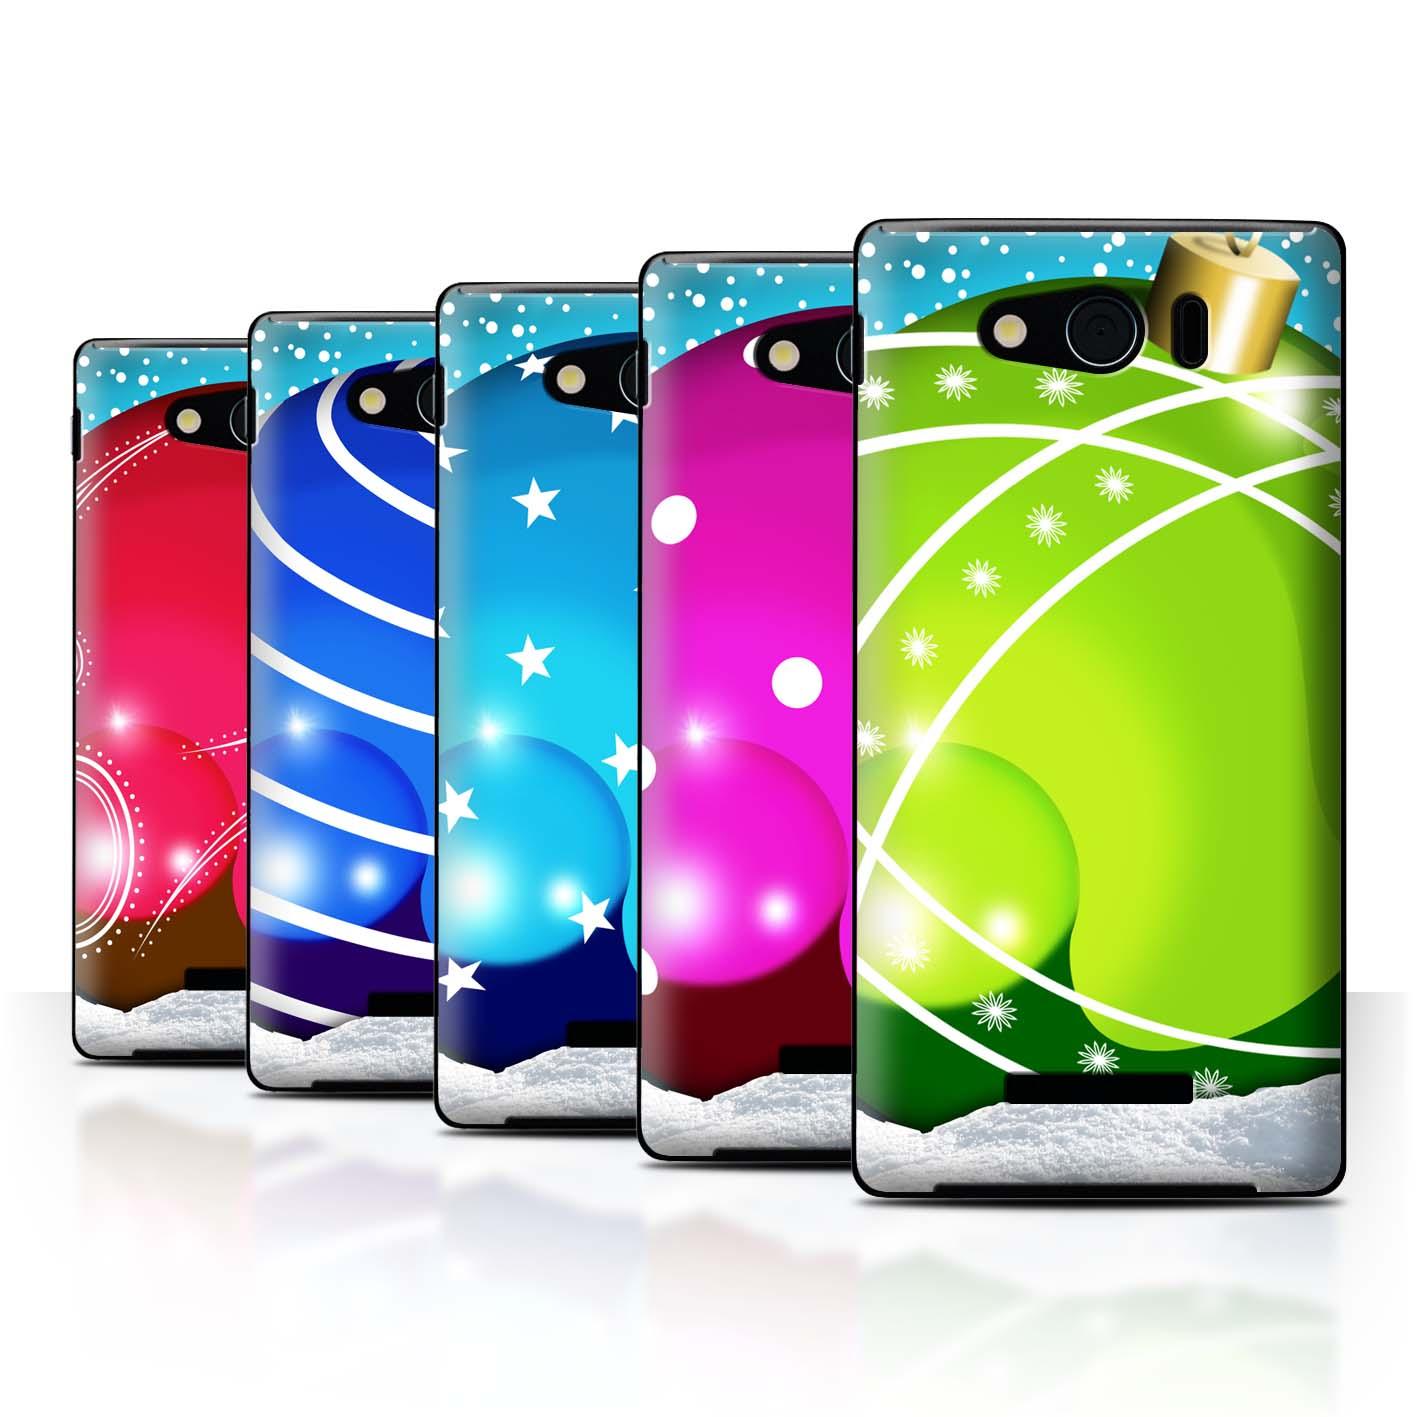 STUFF4-Back-Case-Cover-Skin-for-Sharp-Aquos-Xx-Mini-303SH-Christmas-Baubles